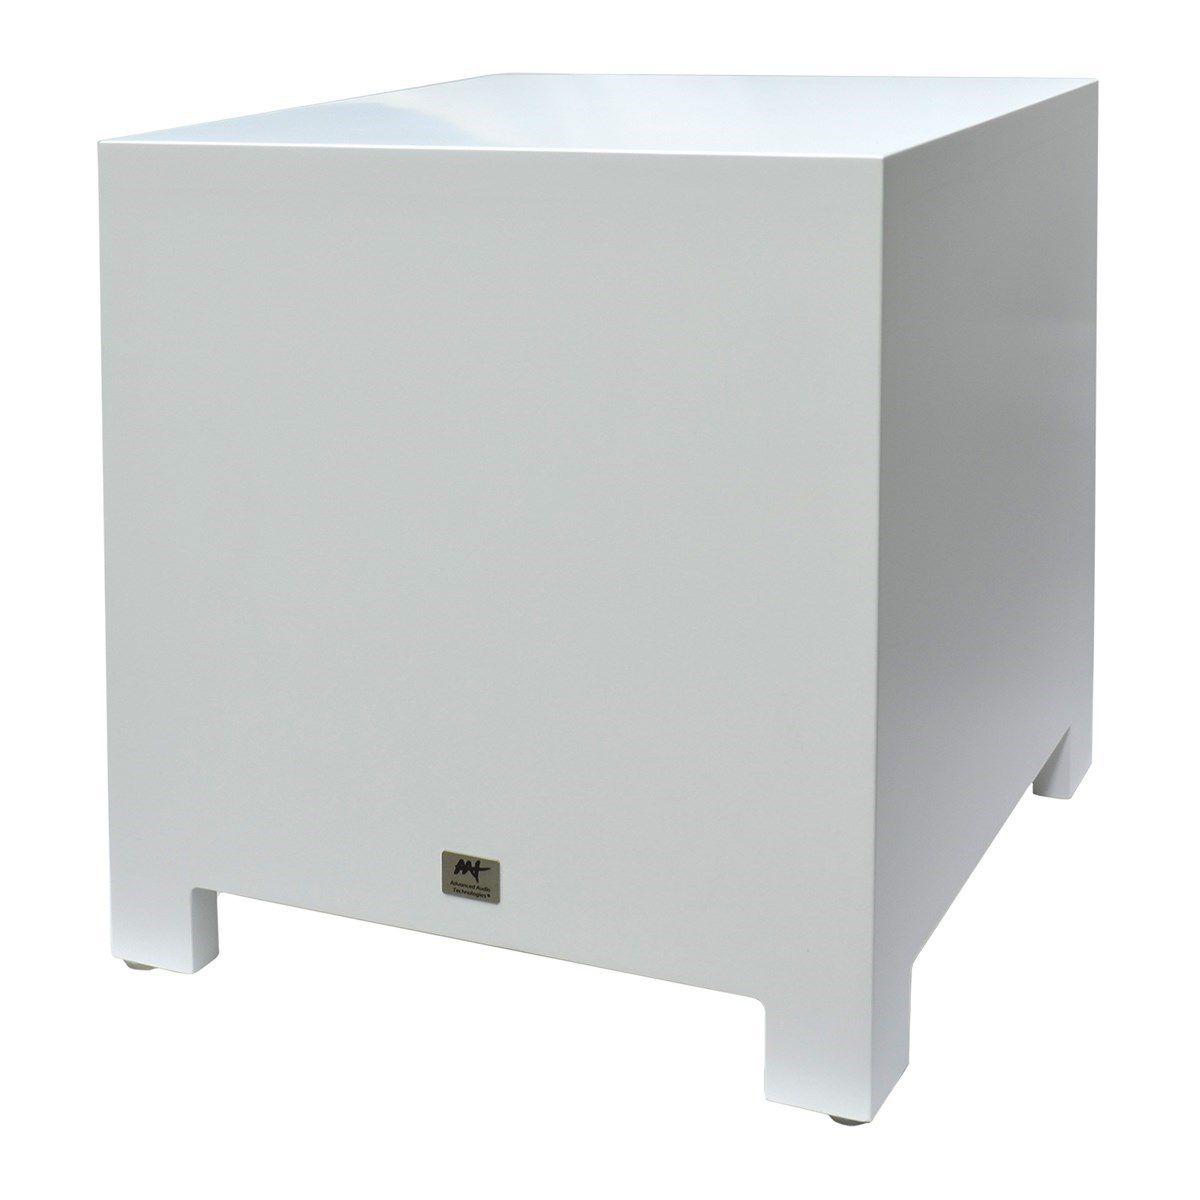 "Kit 7.1 Caixa de Embutir no Gesso LCR-A100 + LR-E100 + Subwoofer Cube Rakt 8"" AAT"